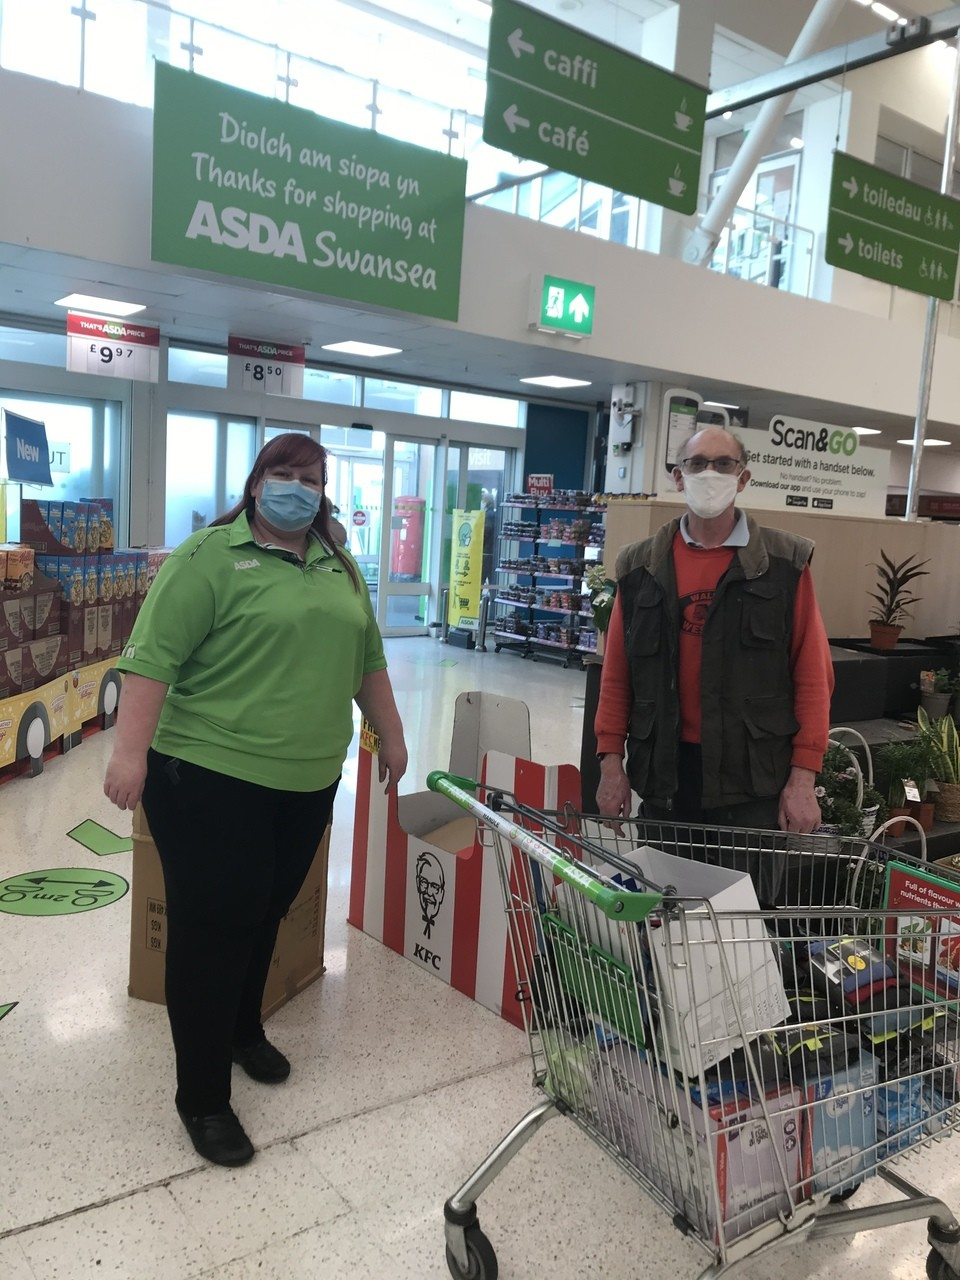 Matts House donation | Asda Swansea